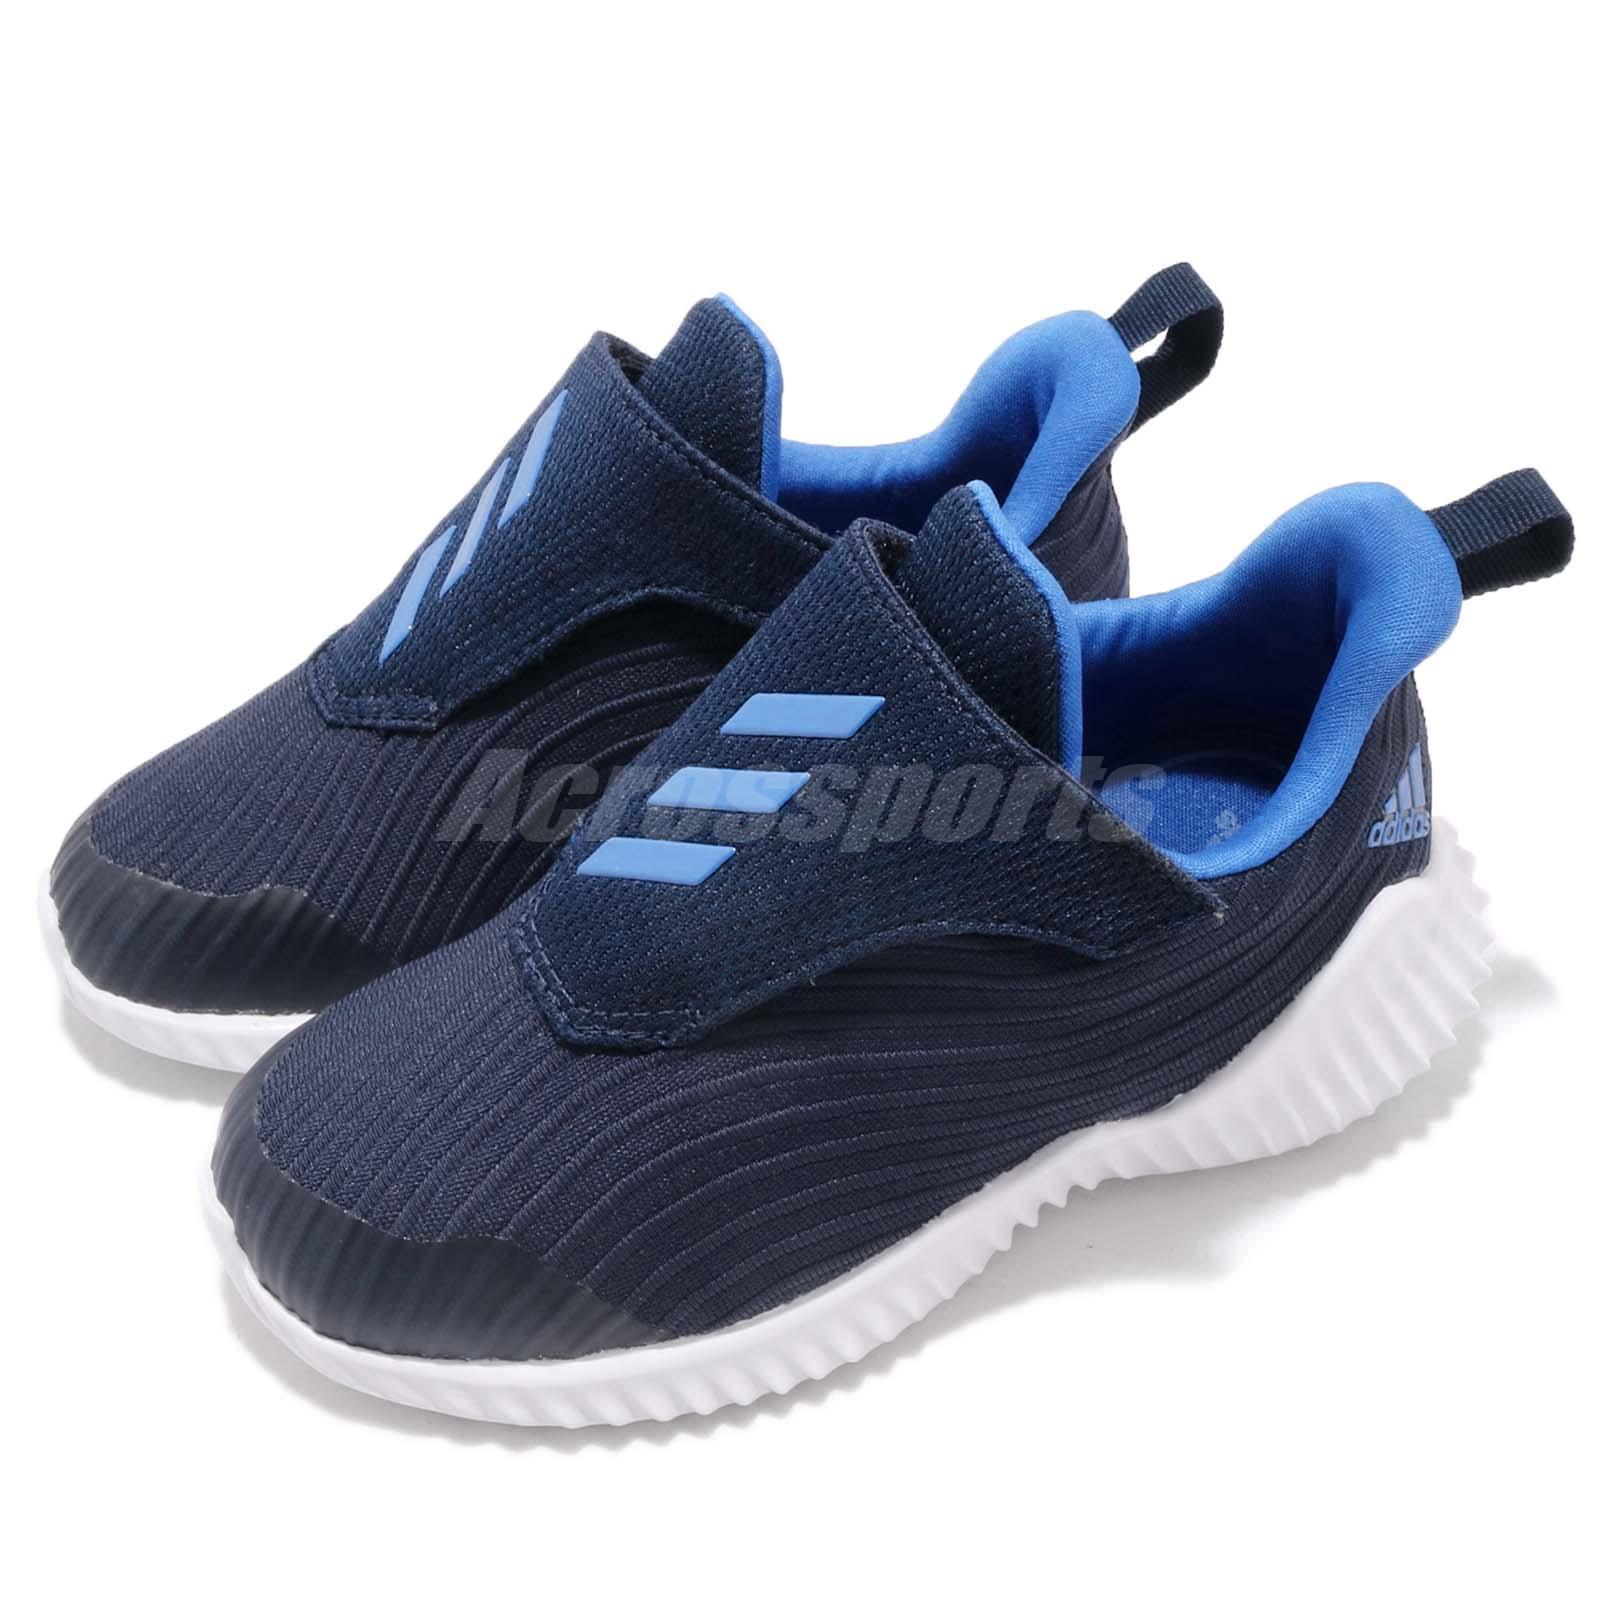 adidas FortaRun AC I Navy Blue White TD